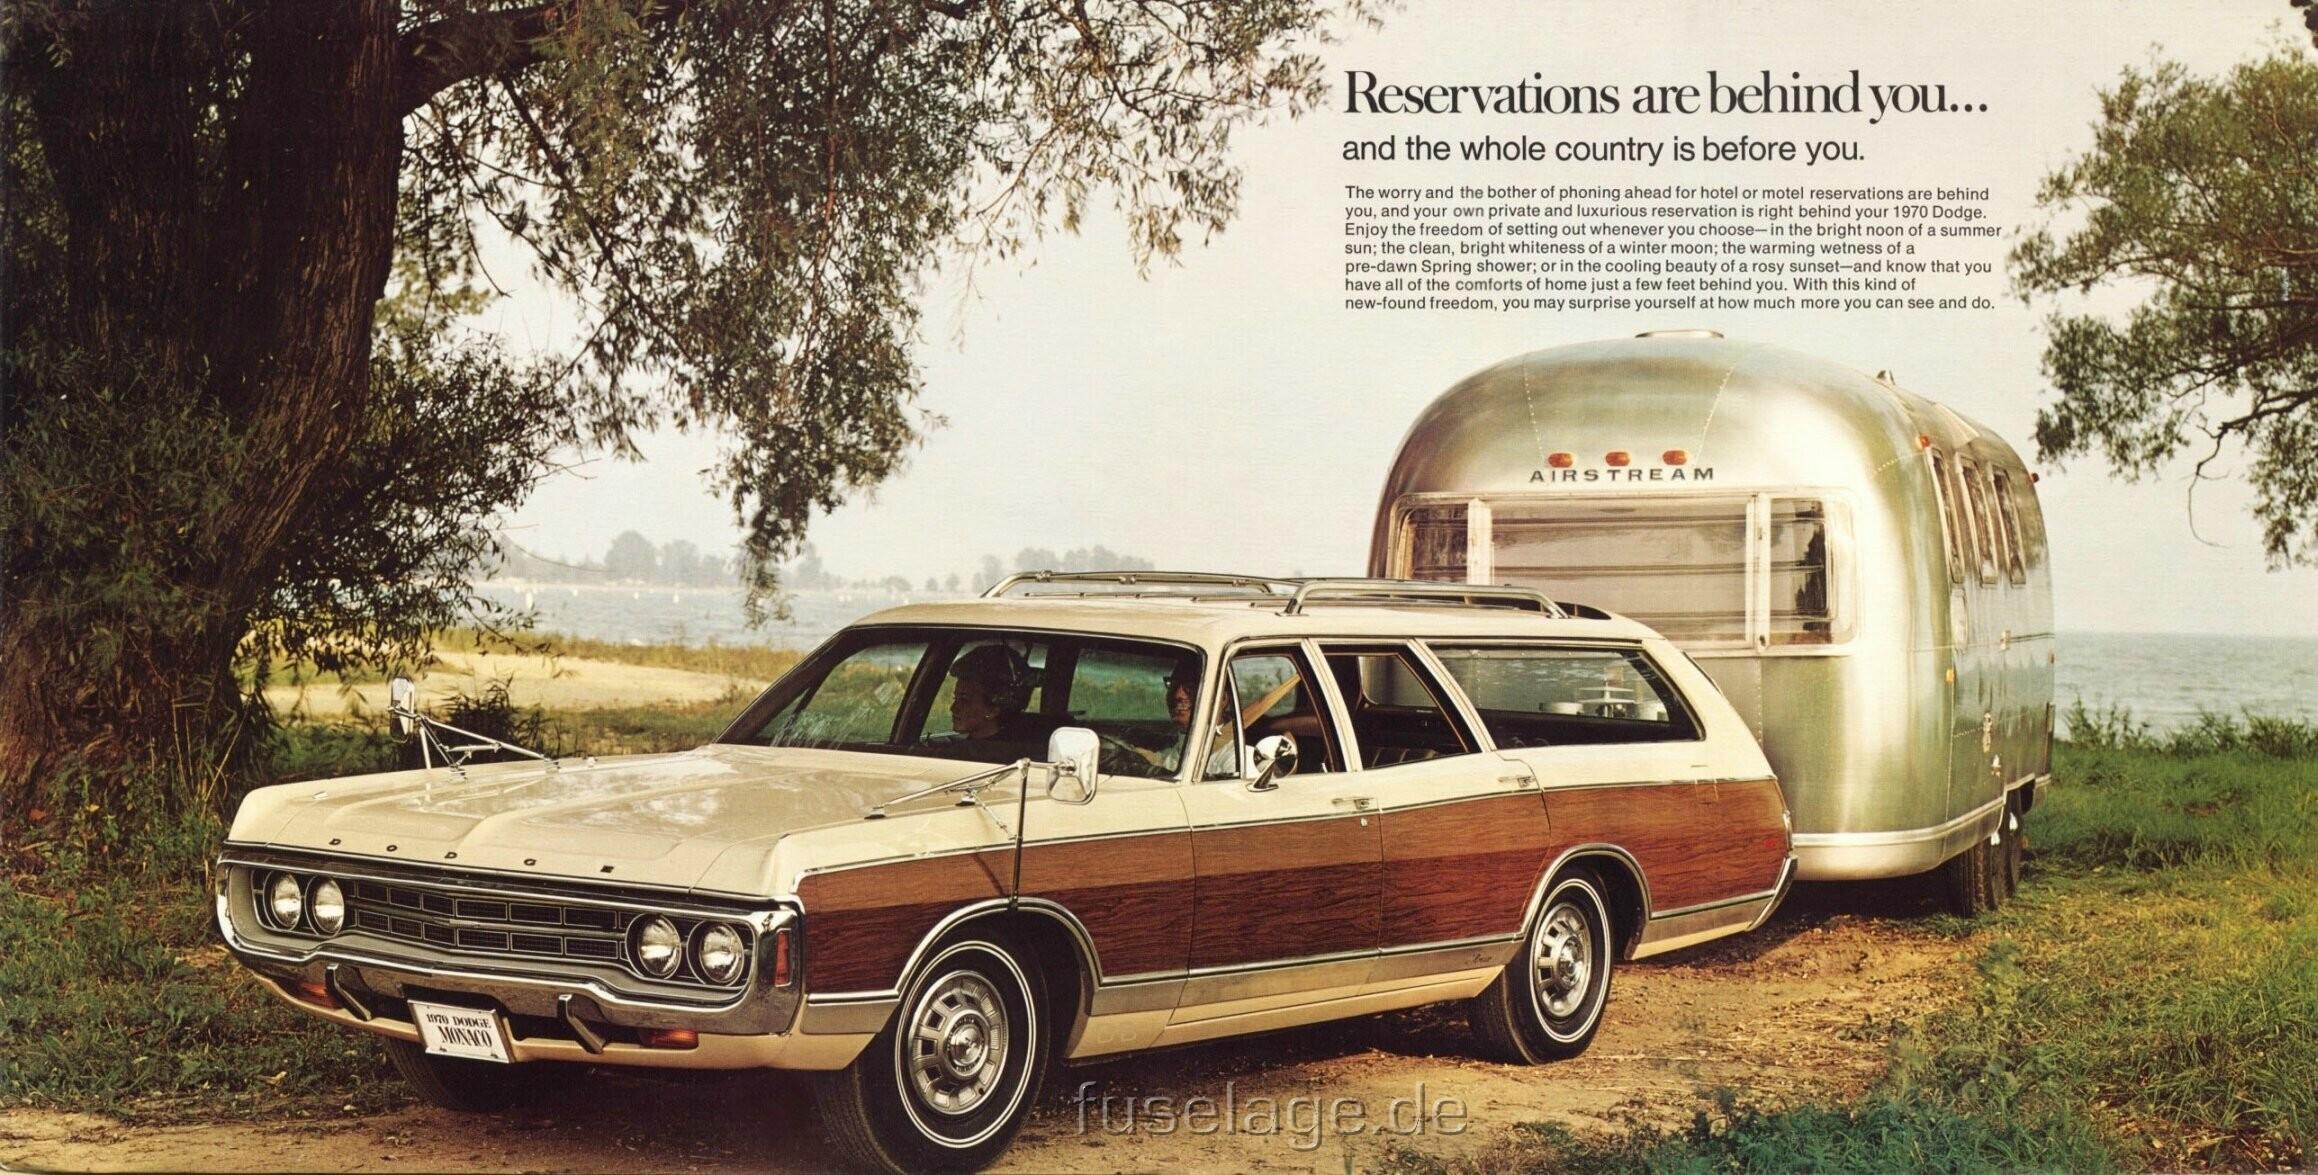 1970 Chevrolet Kingswood Station Wagon – SOLD